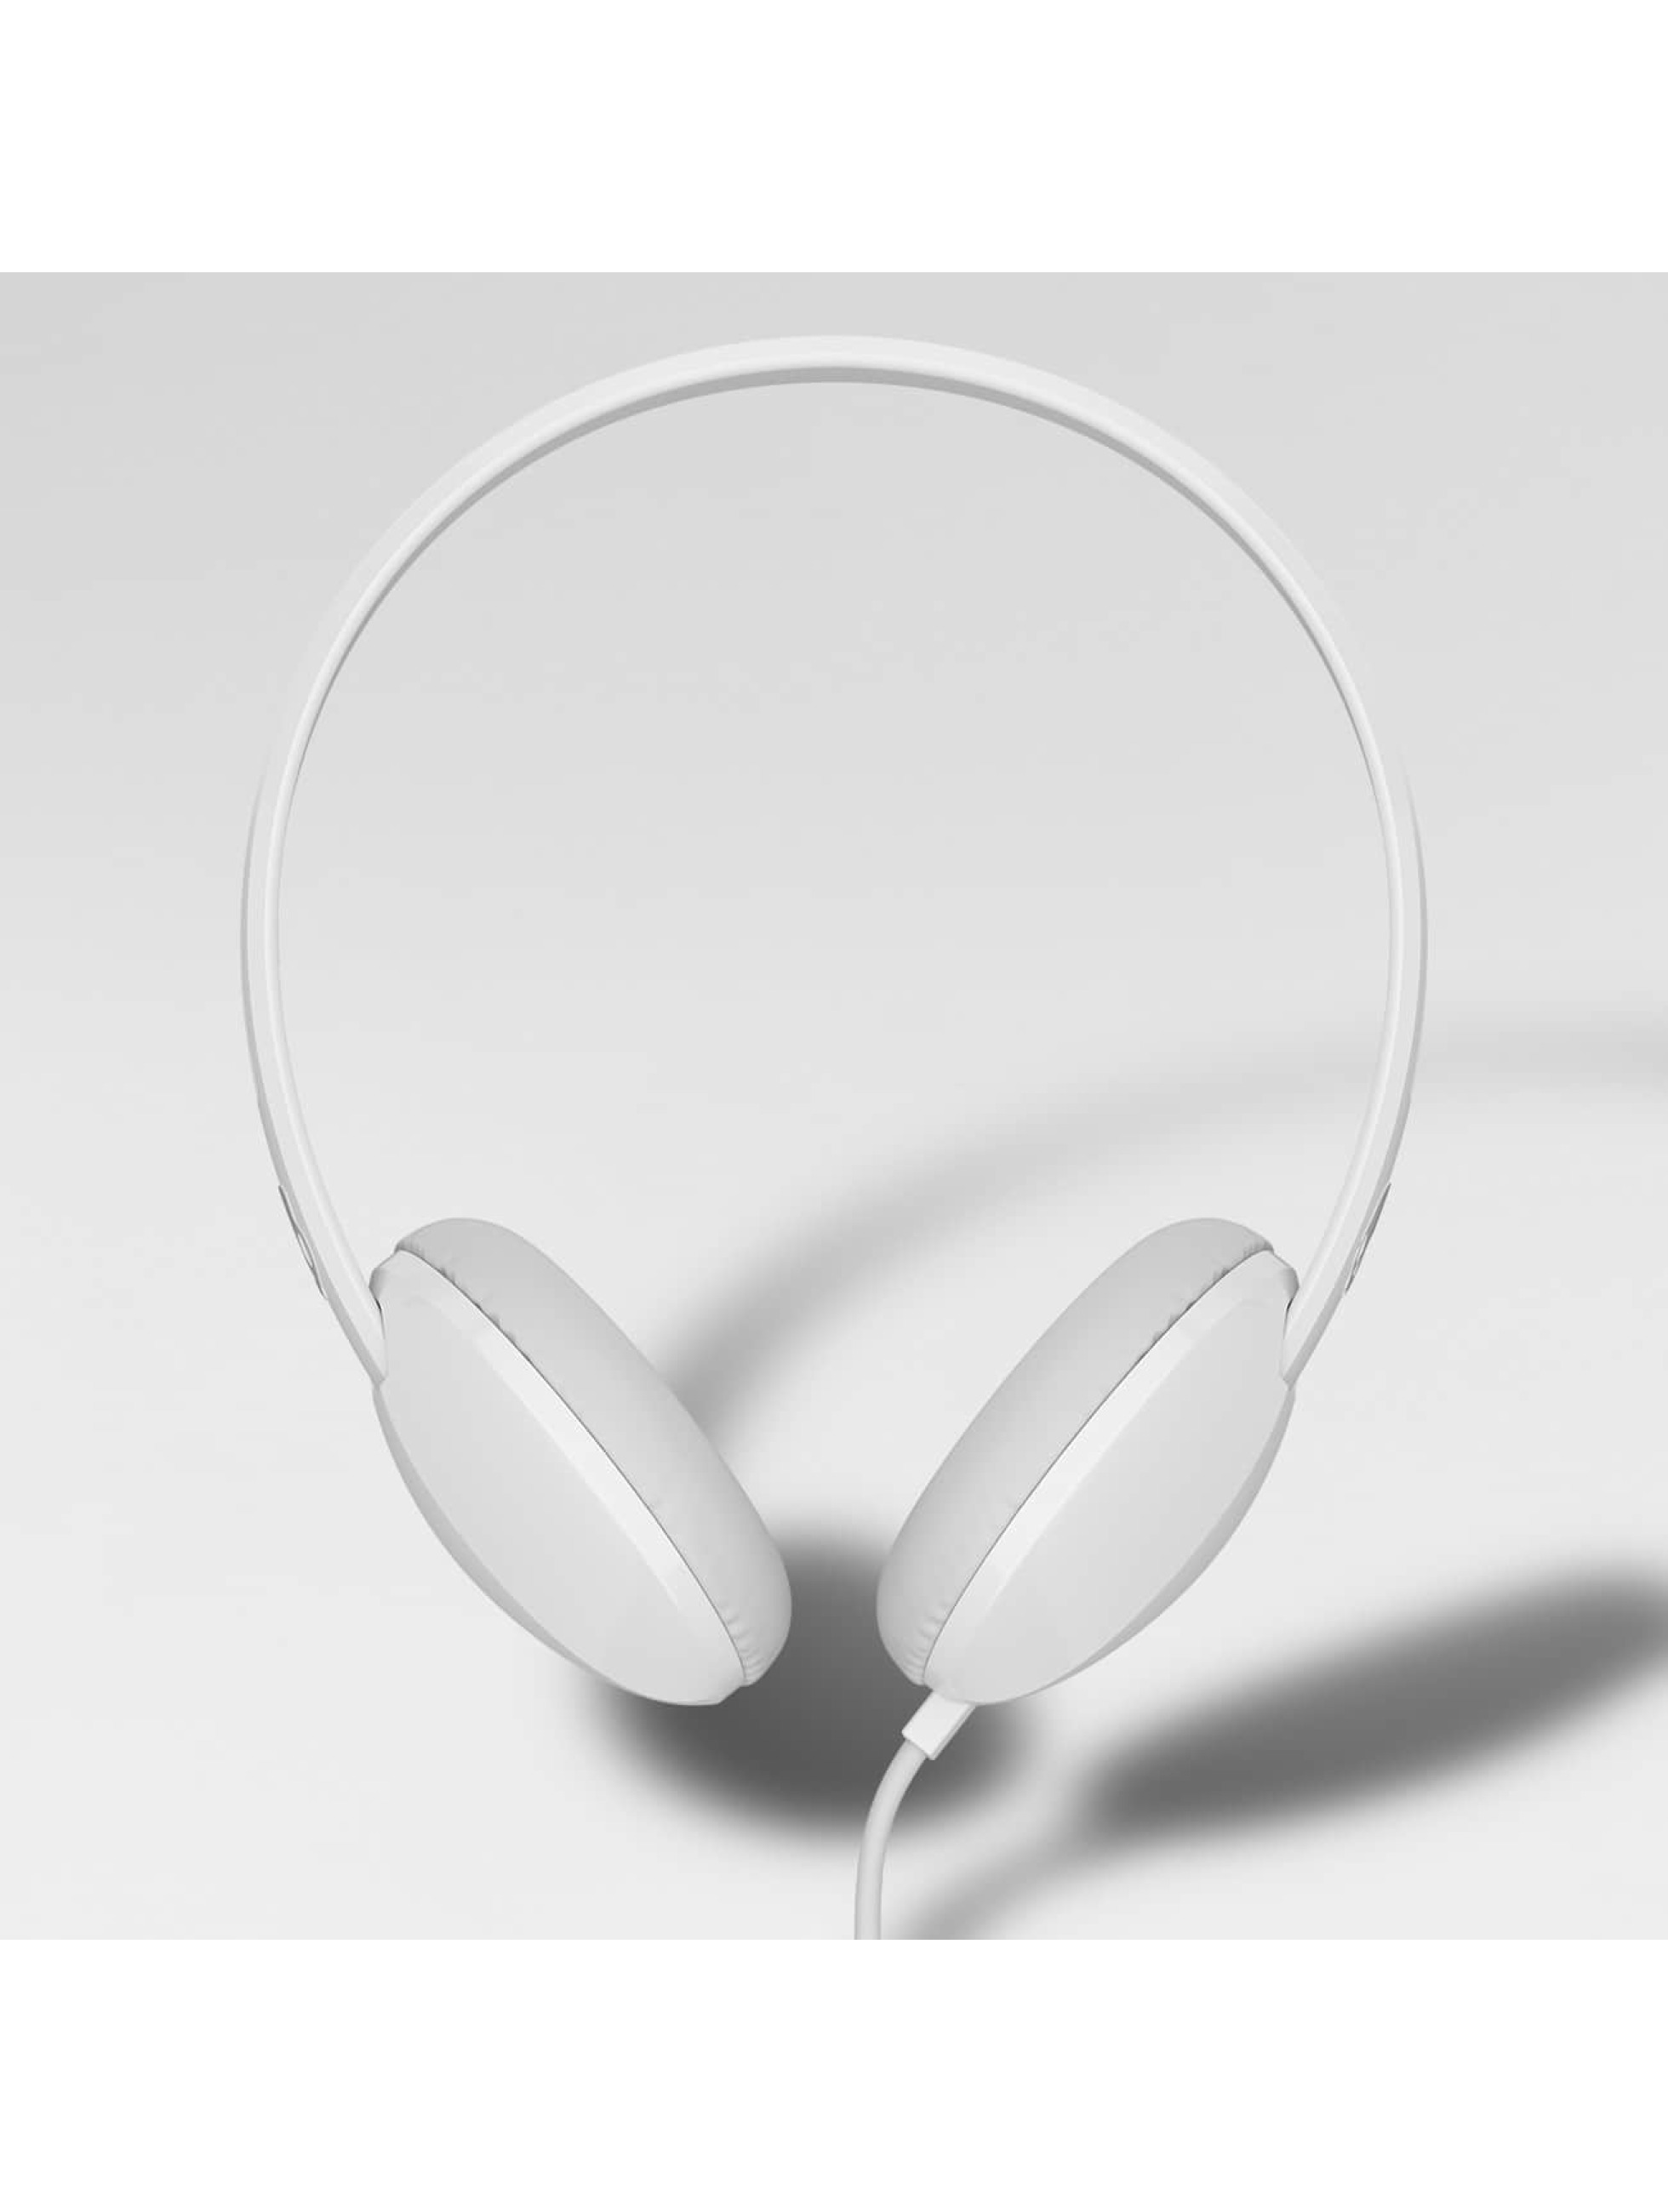 Skullcandy Sluchátka Stim Mic 1 On Ear biela